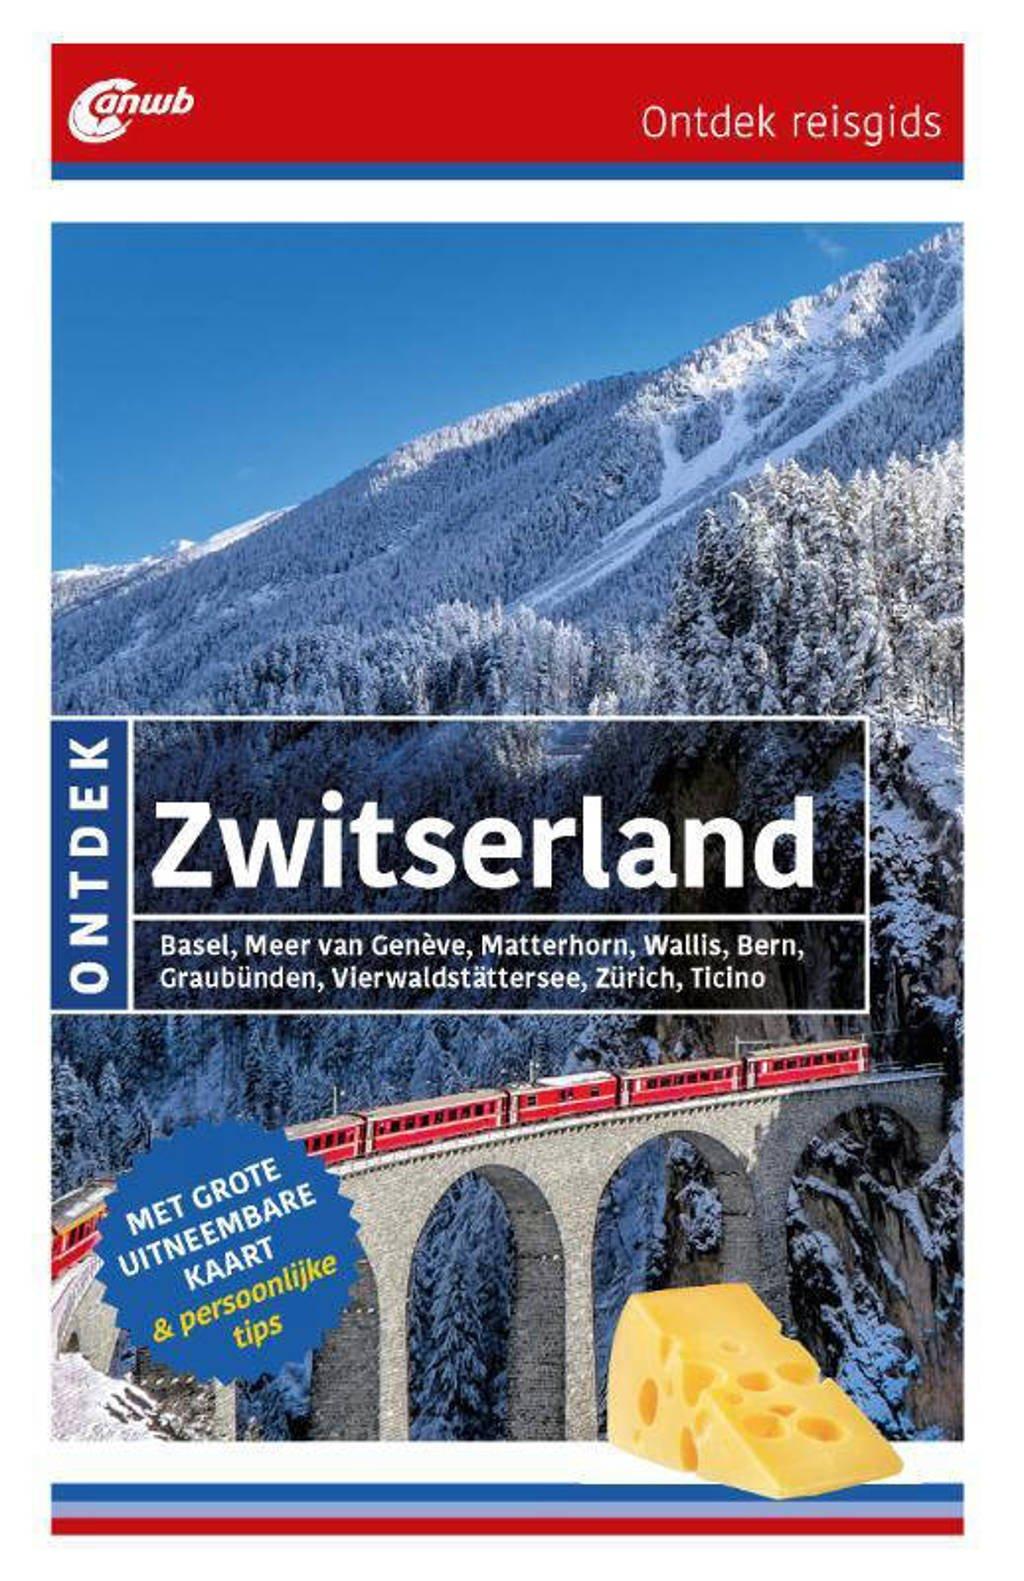 f35e43bad2d ANWB Ontdek reisgids: Ontdek Zwitserland | wehkamp